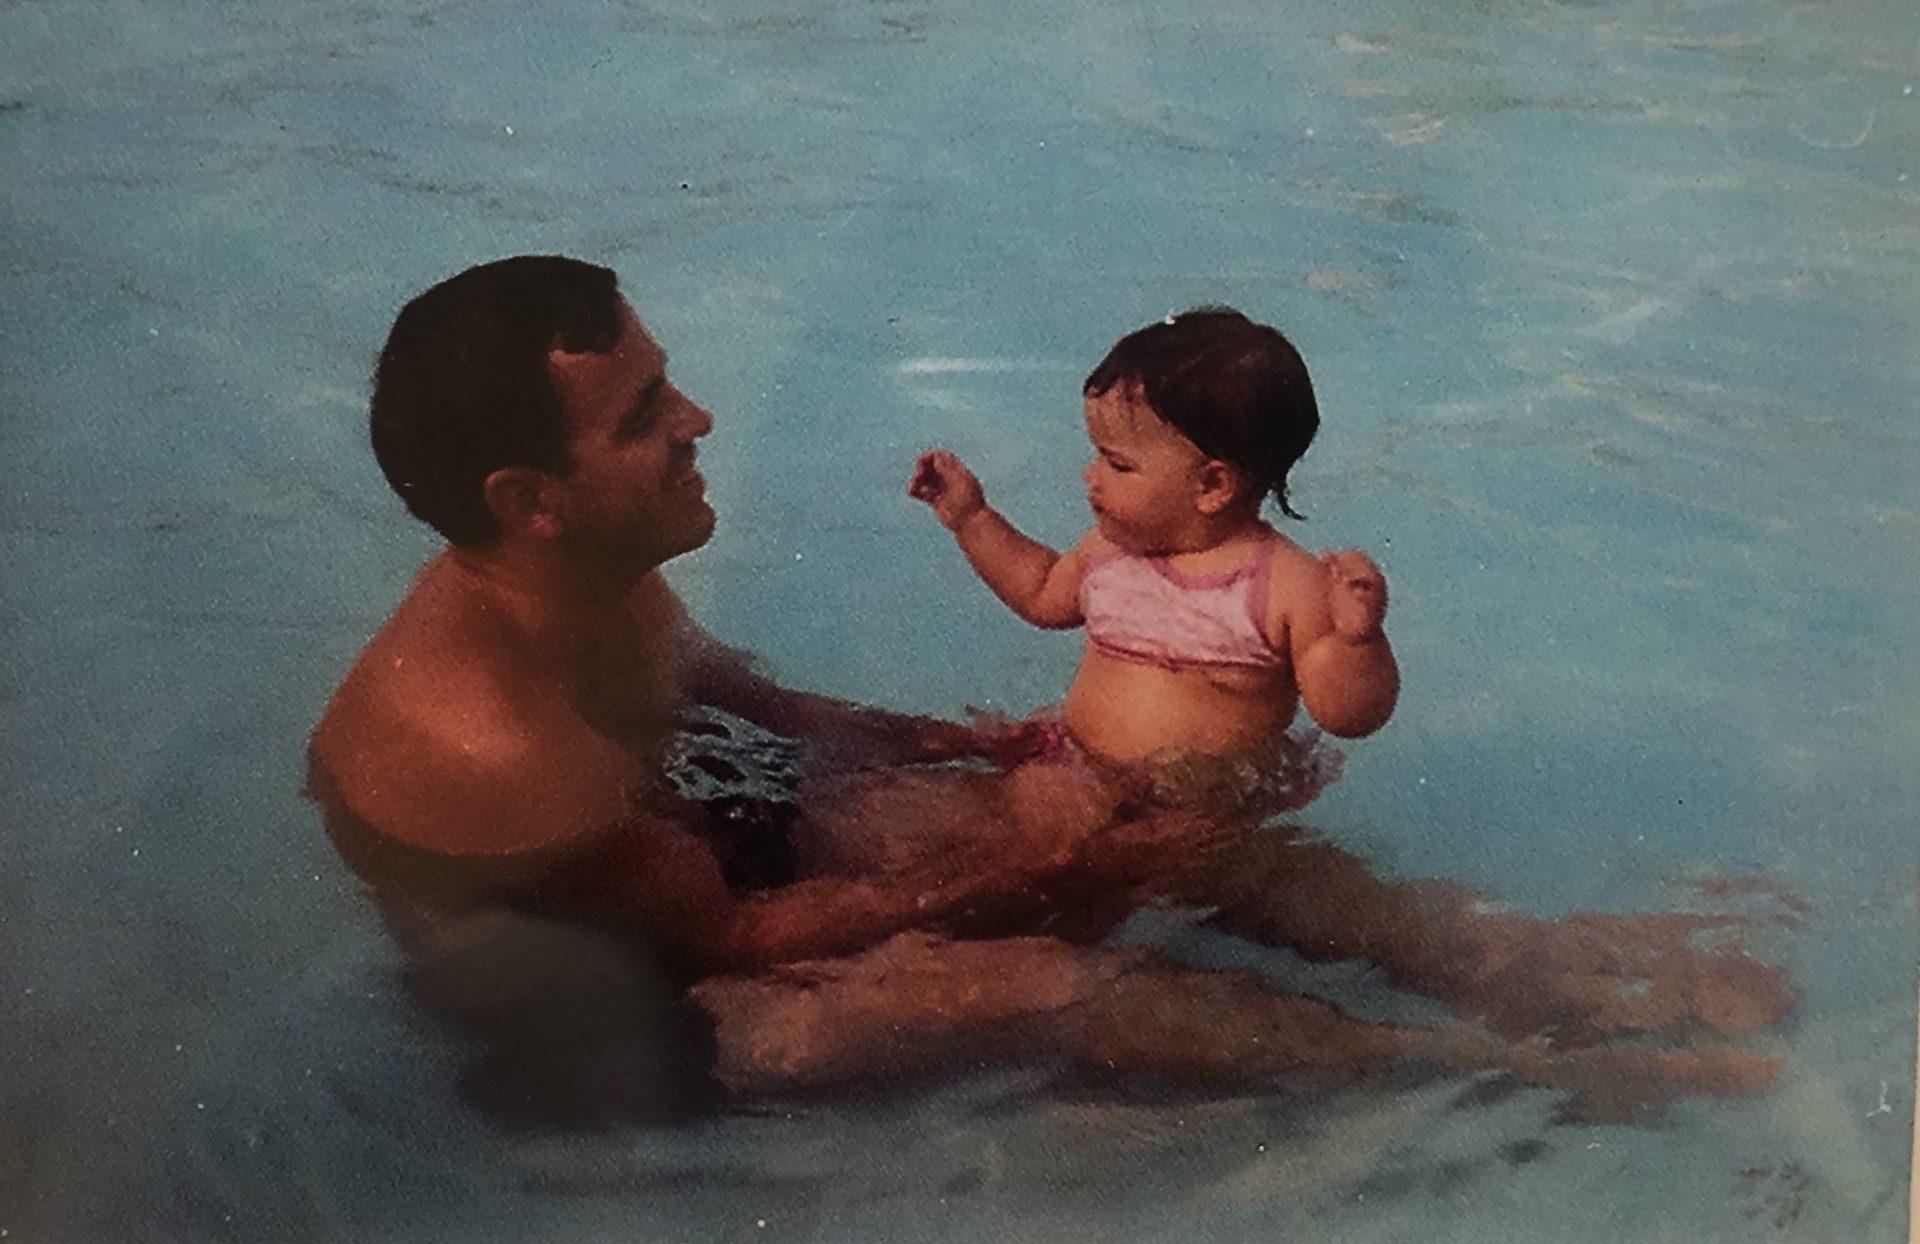 Swimming with Dad. Worthington, Ohio